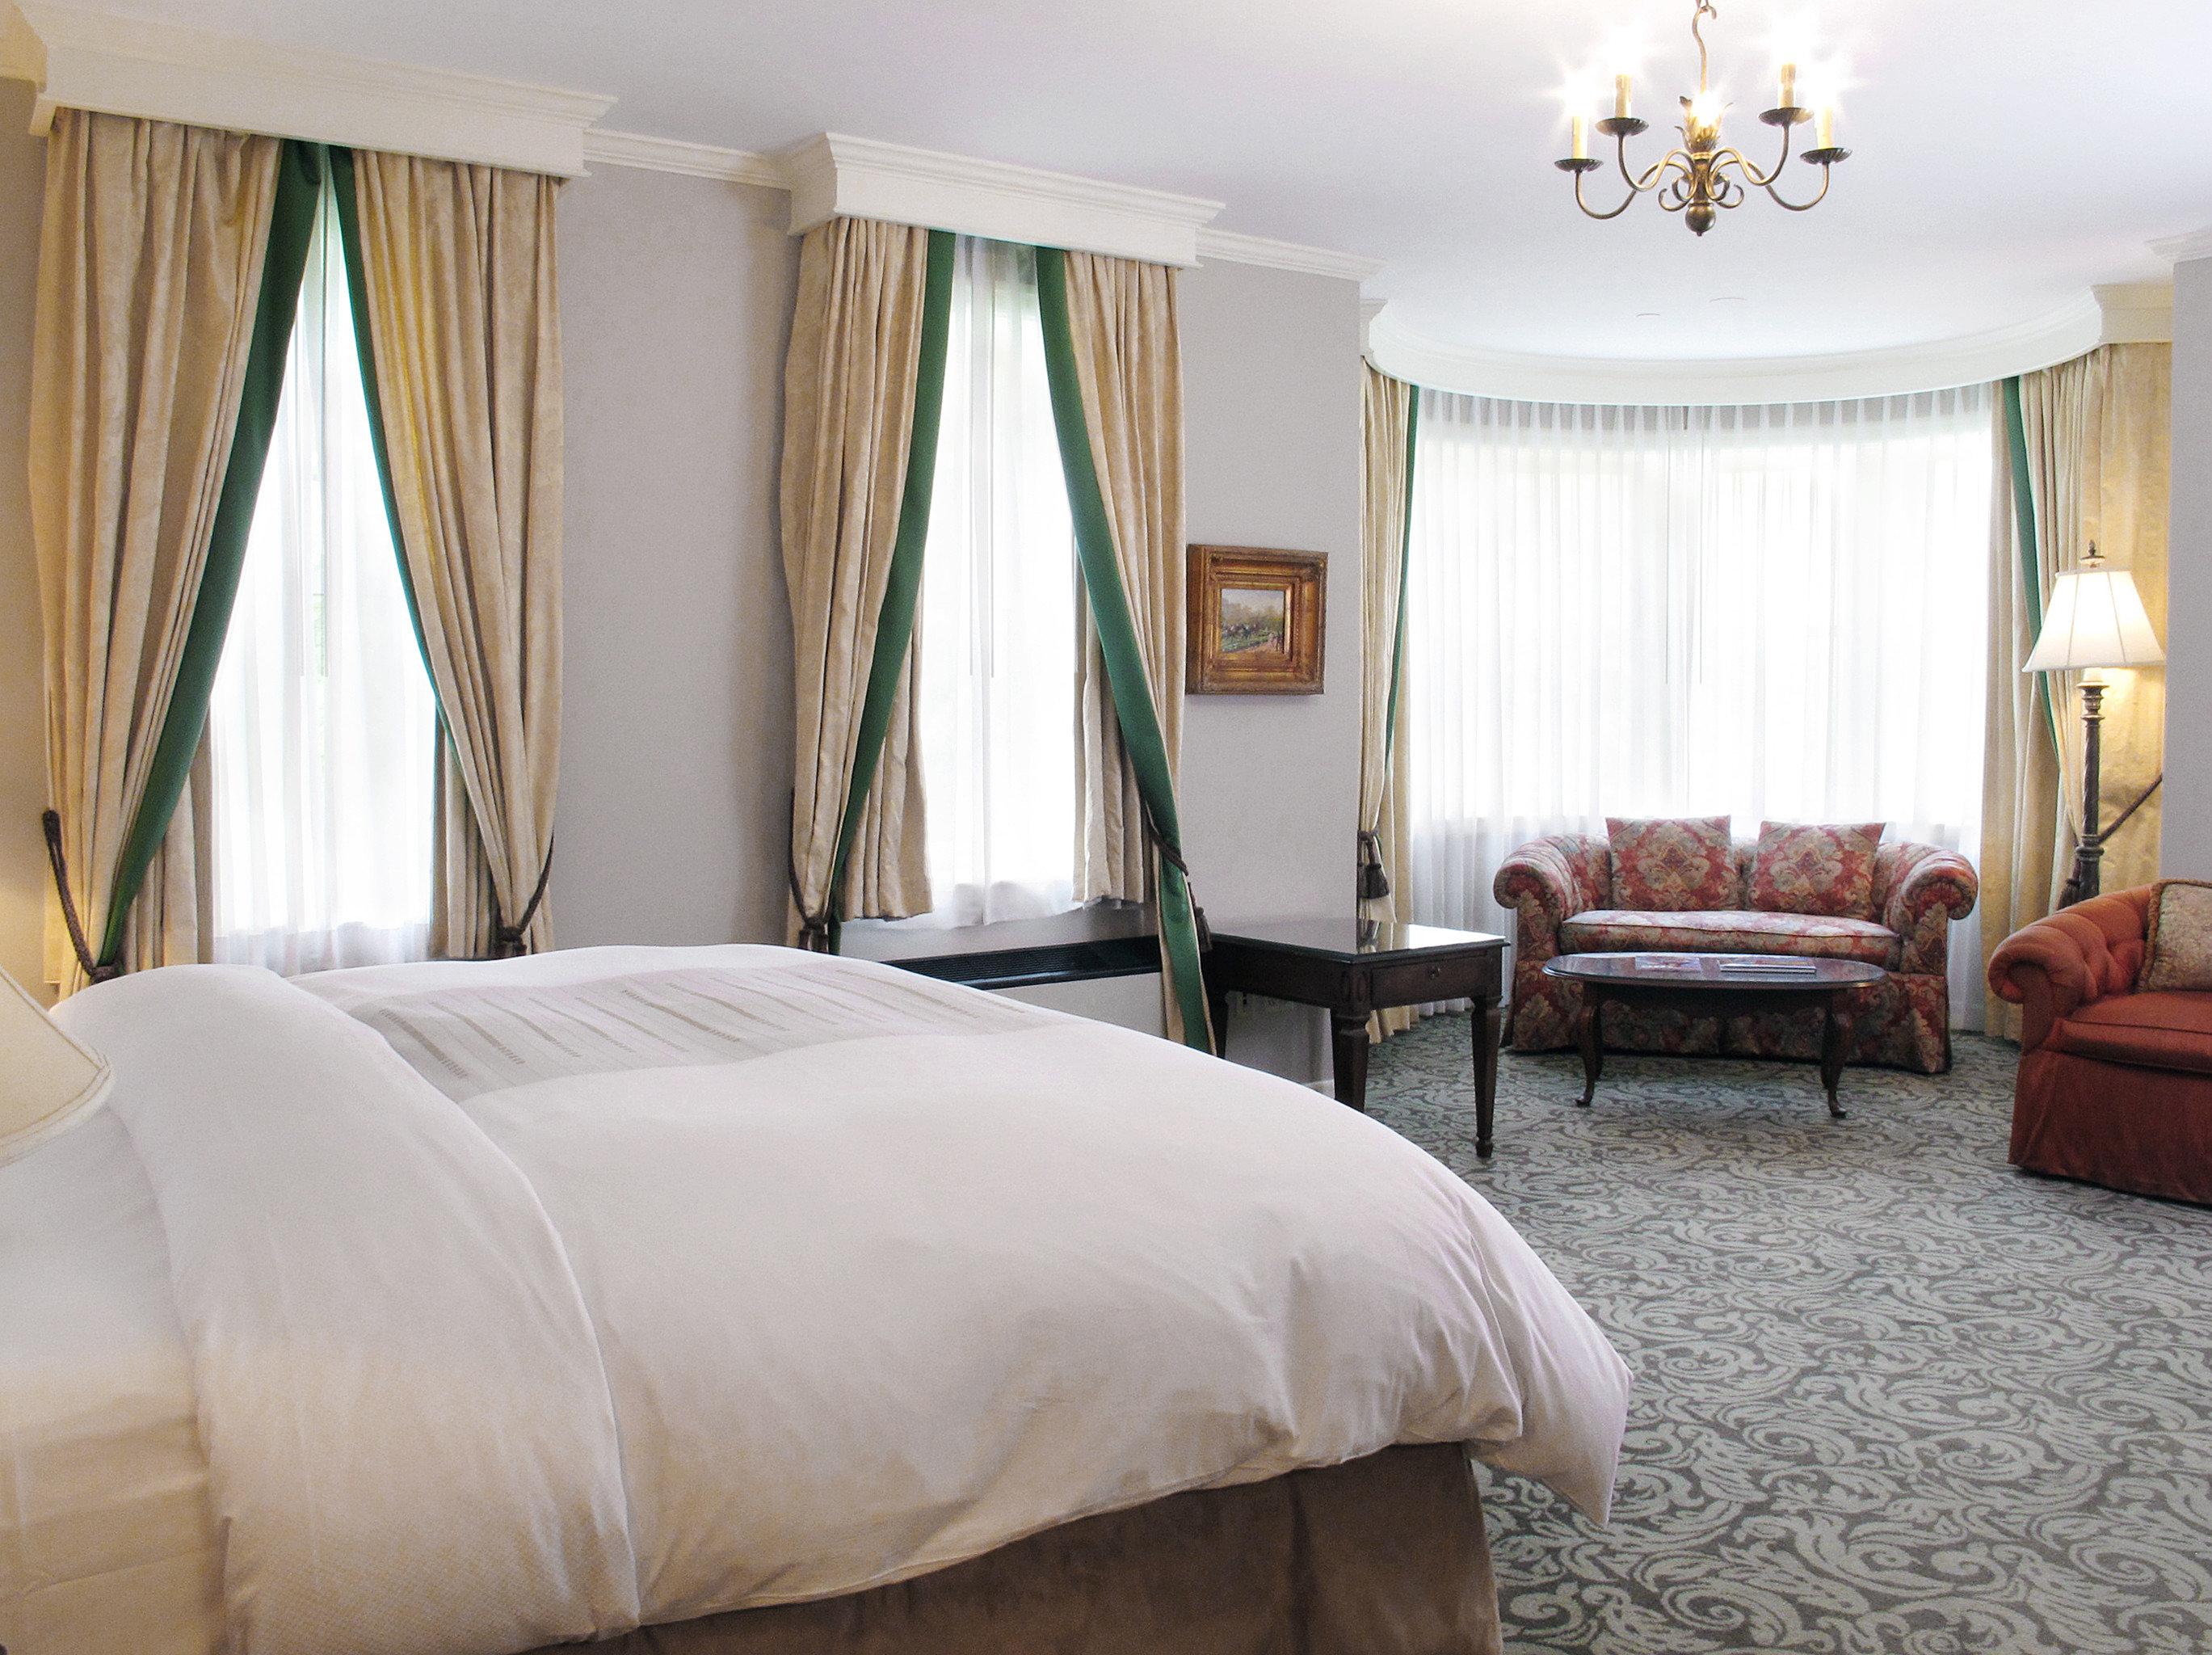 Bedroom Elegant Historic sofa property curtain Suite cottage pillow lamp